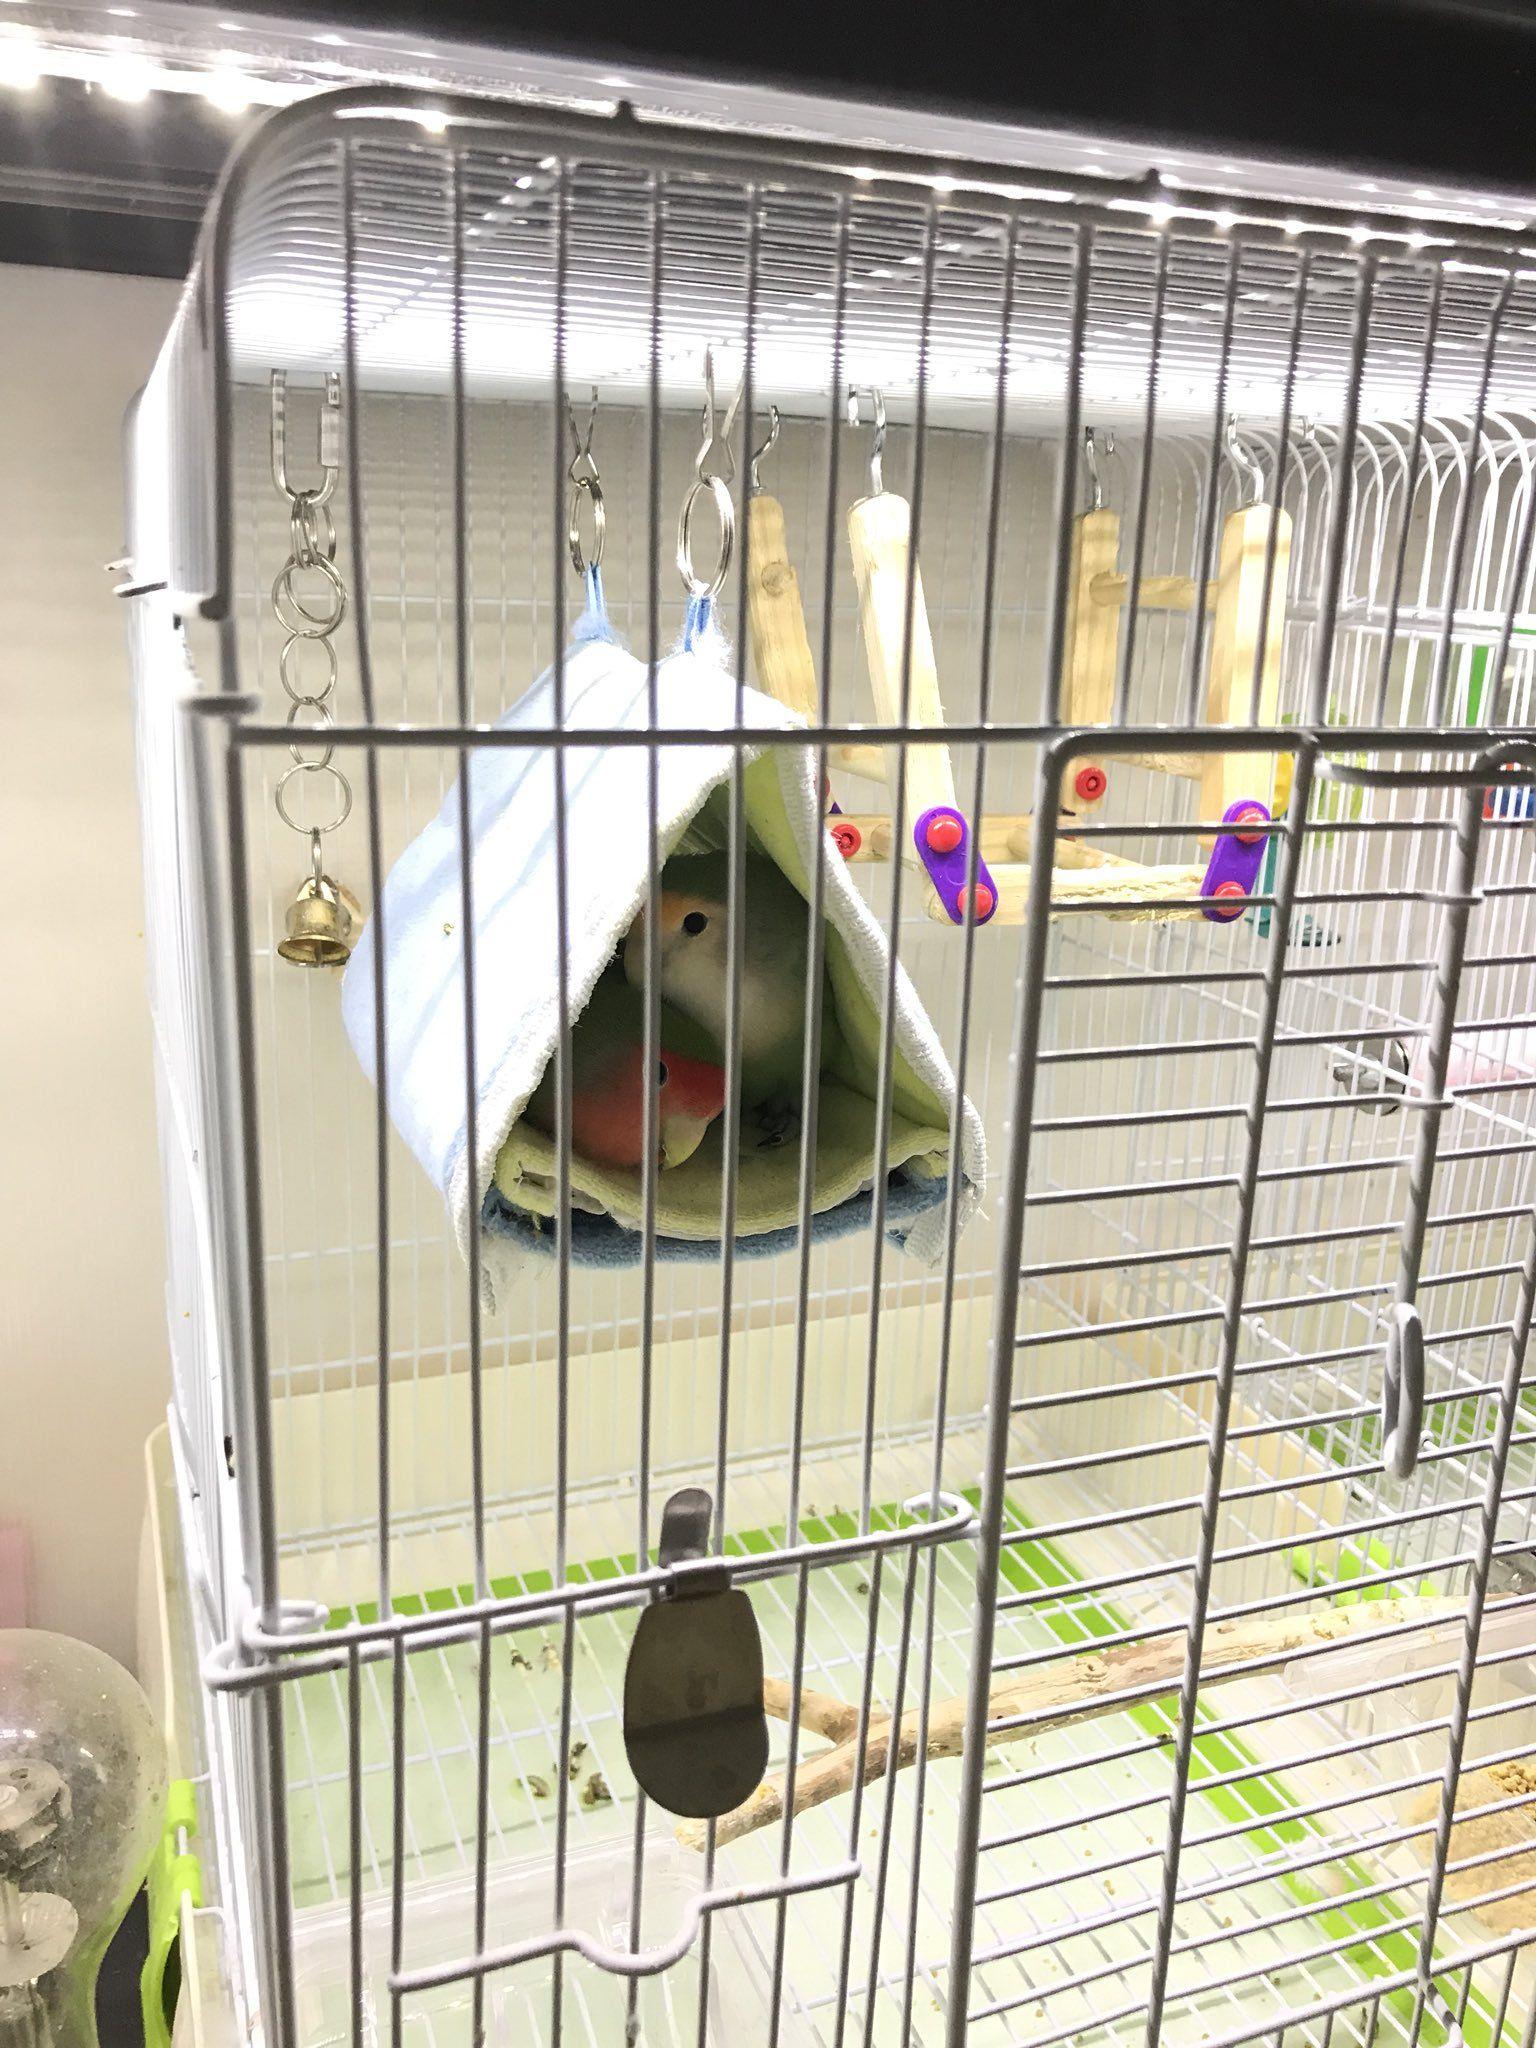 Media Tweets By とりっぴー 小鳥用品専門店 仙台 Bird Torippie Twitter 動物看護士 小鳥 愛玩動物